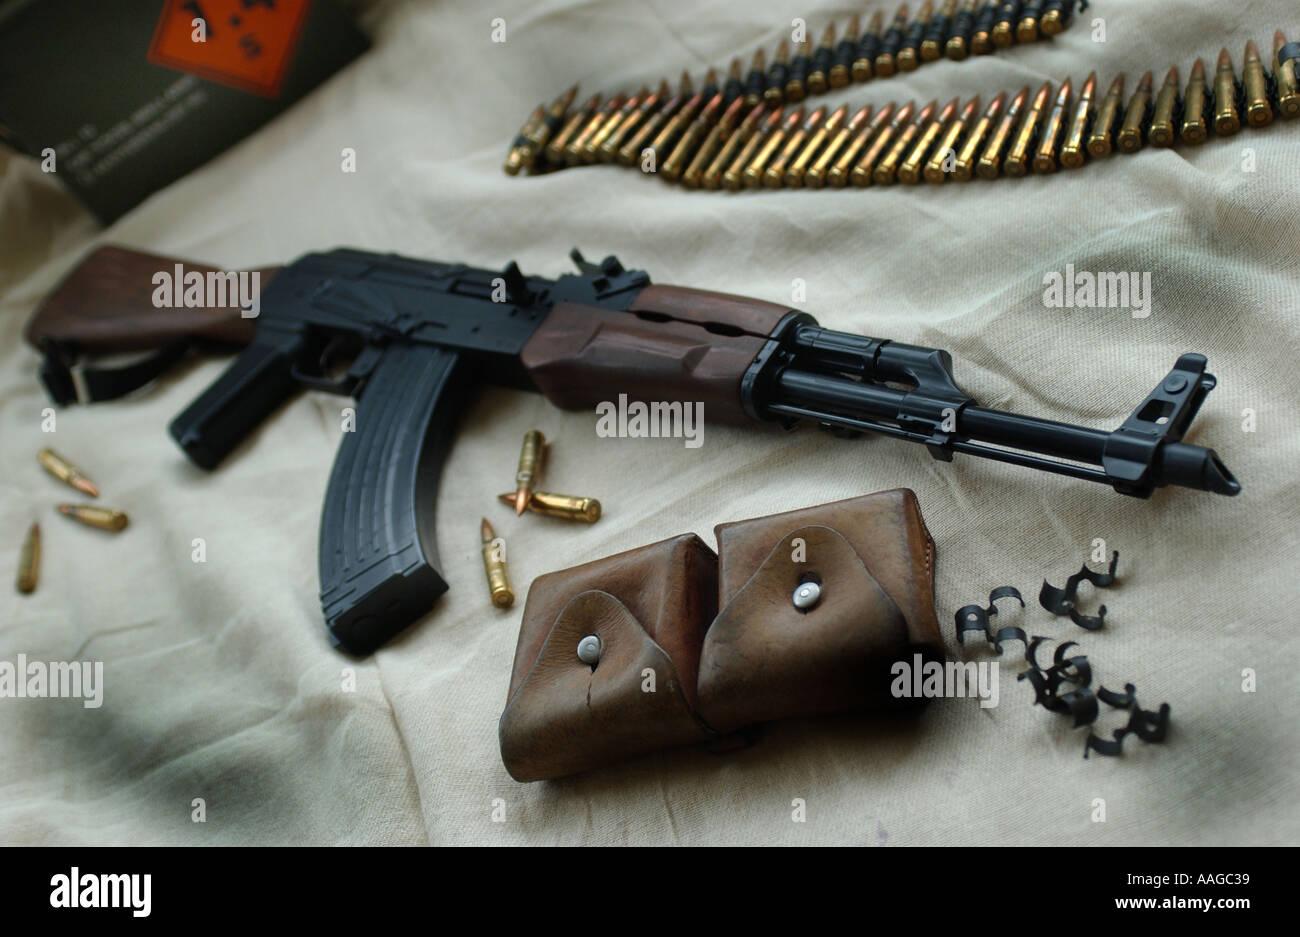 Ak 47 Bullet Belt